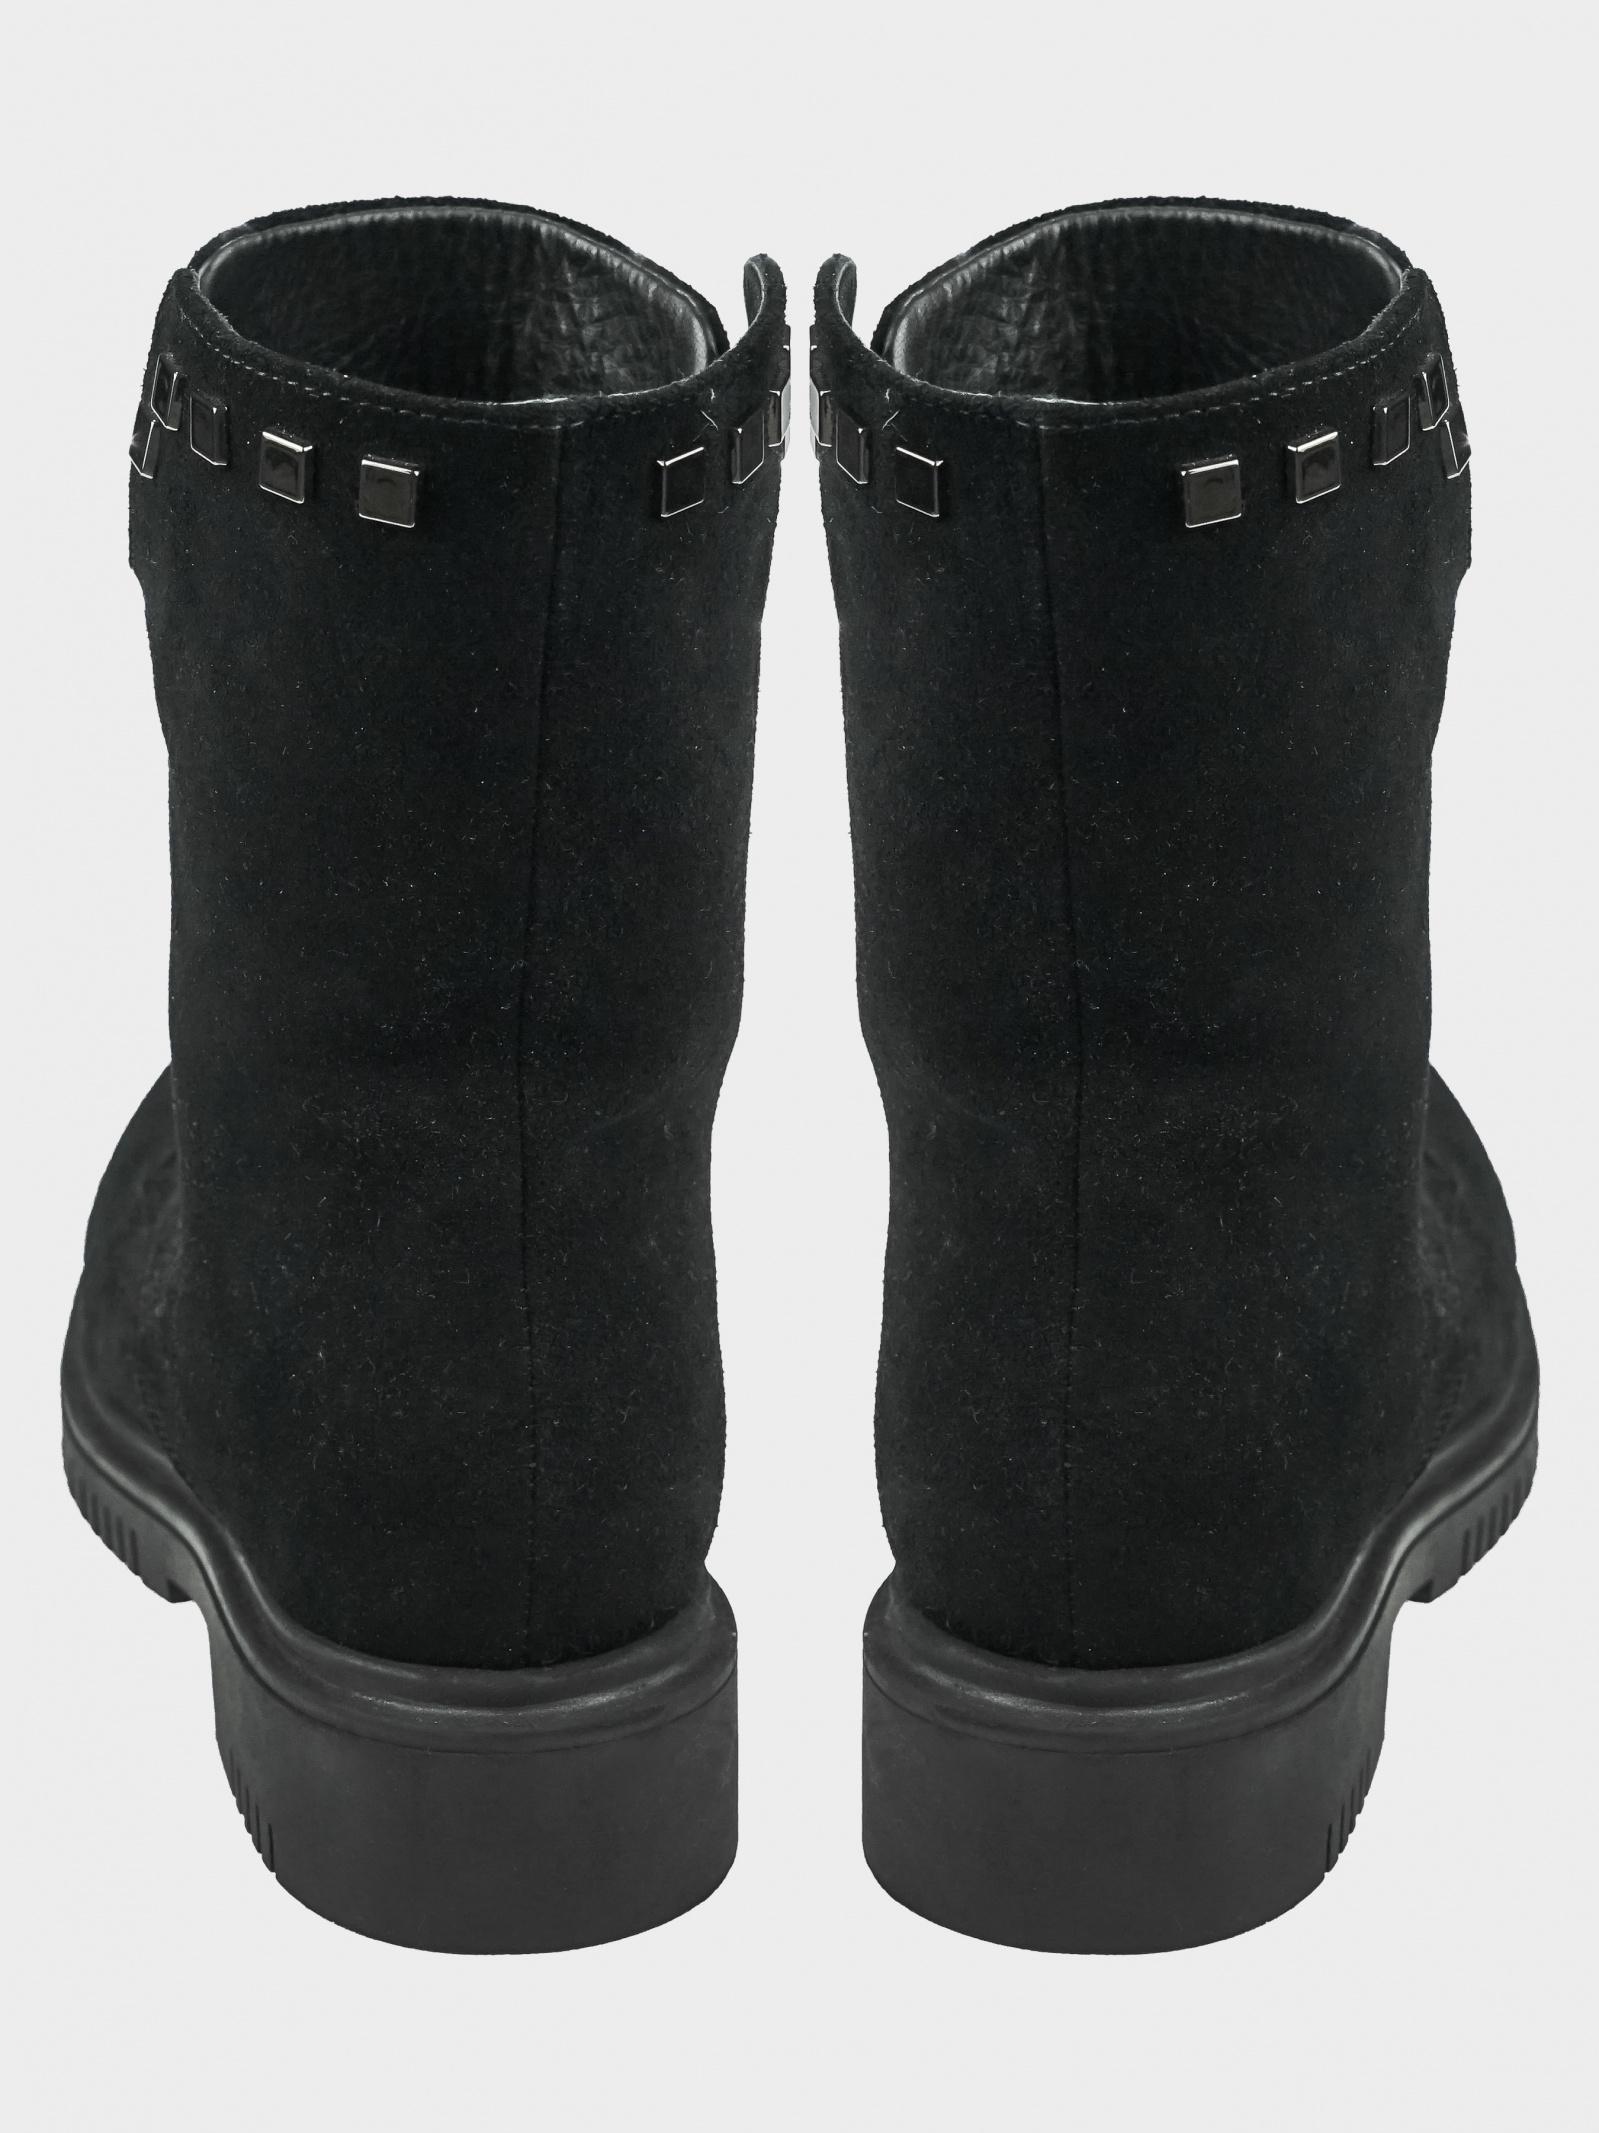 Ботинки женские Ботинки LZ6318-21 размеры обуви, 2017